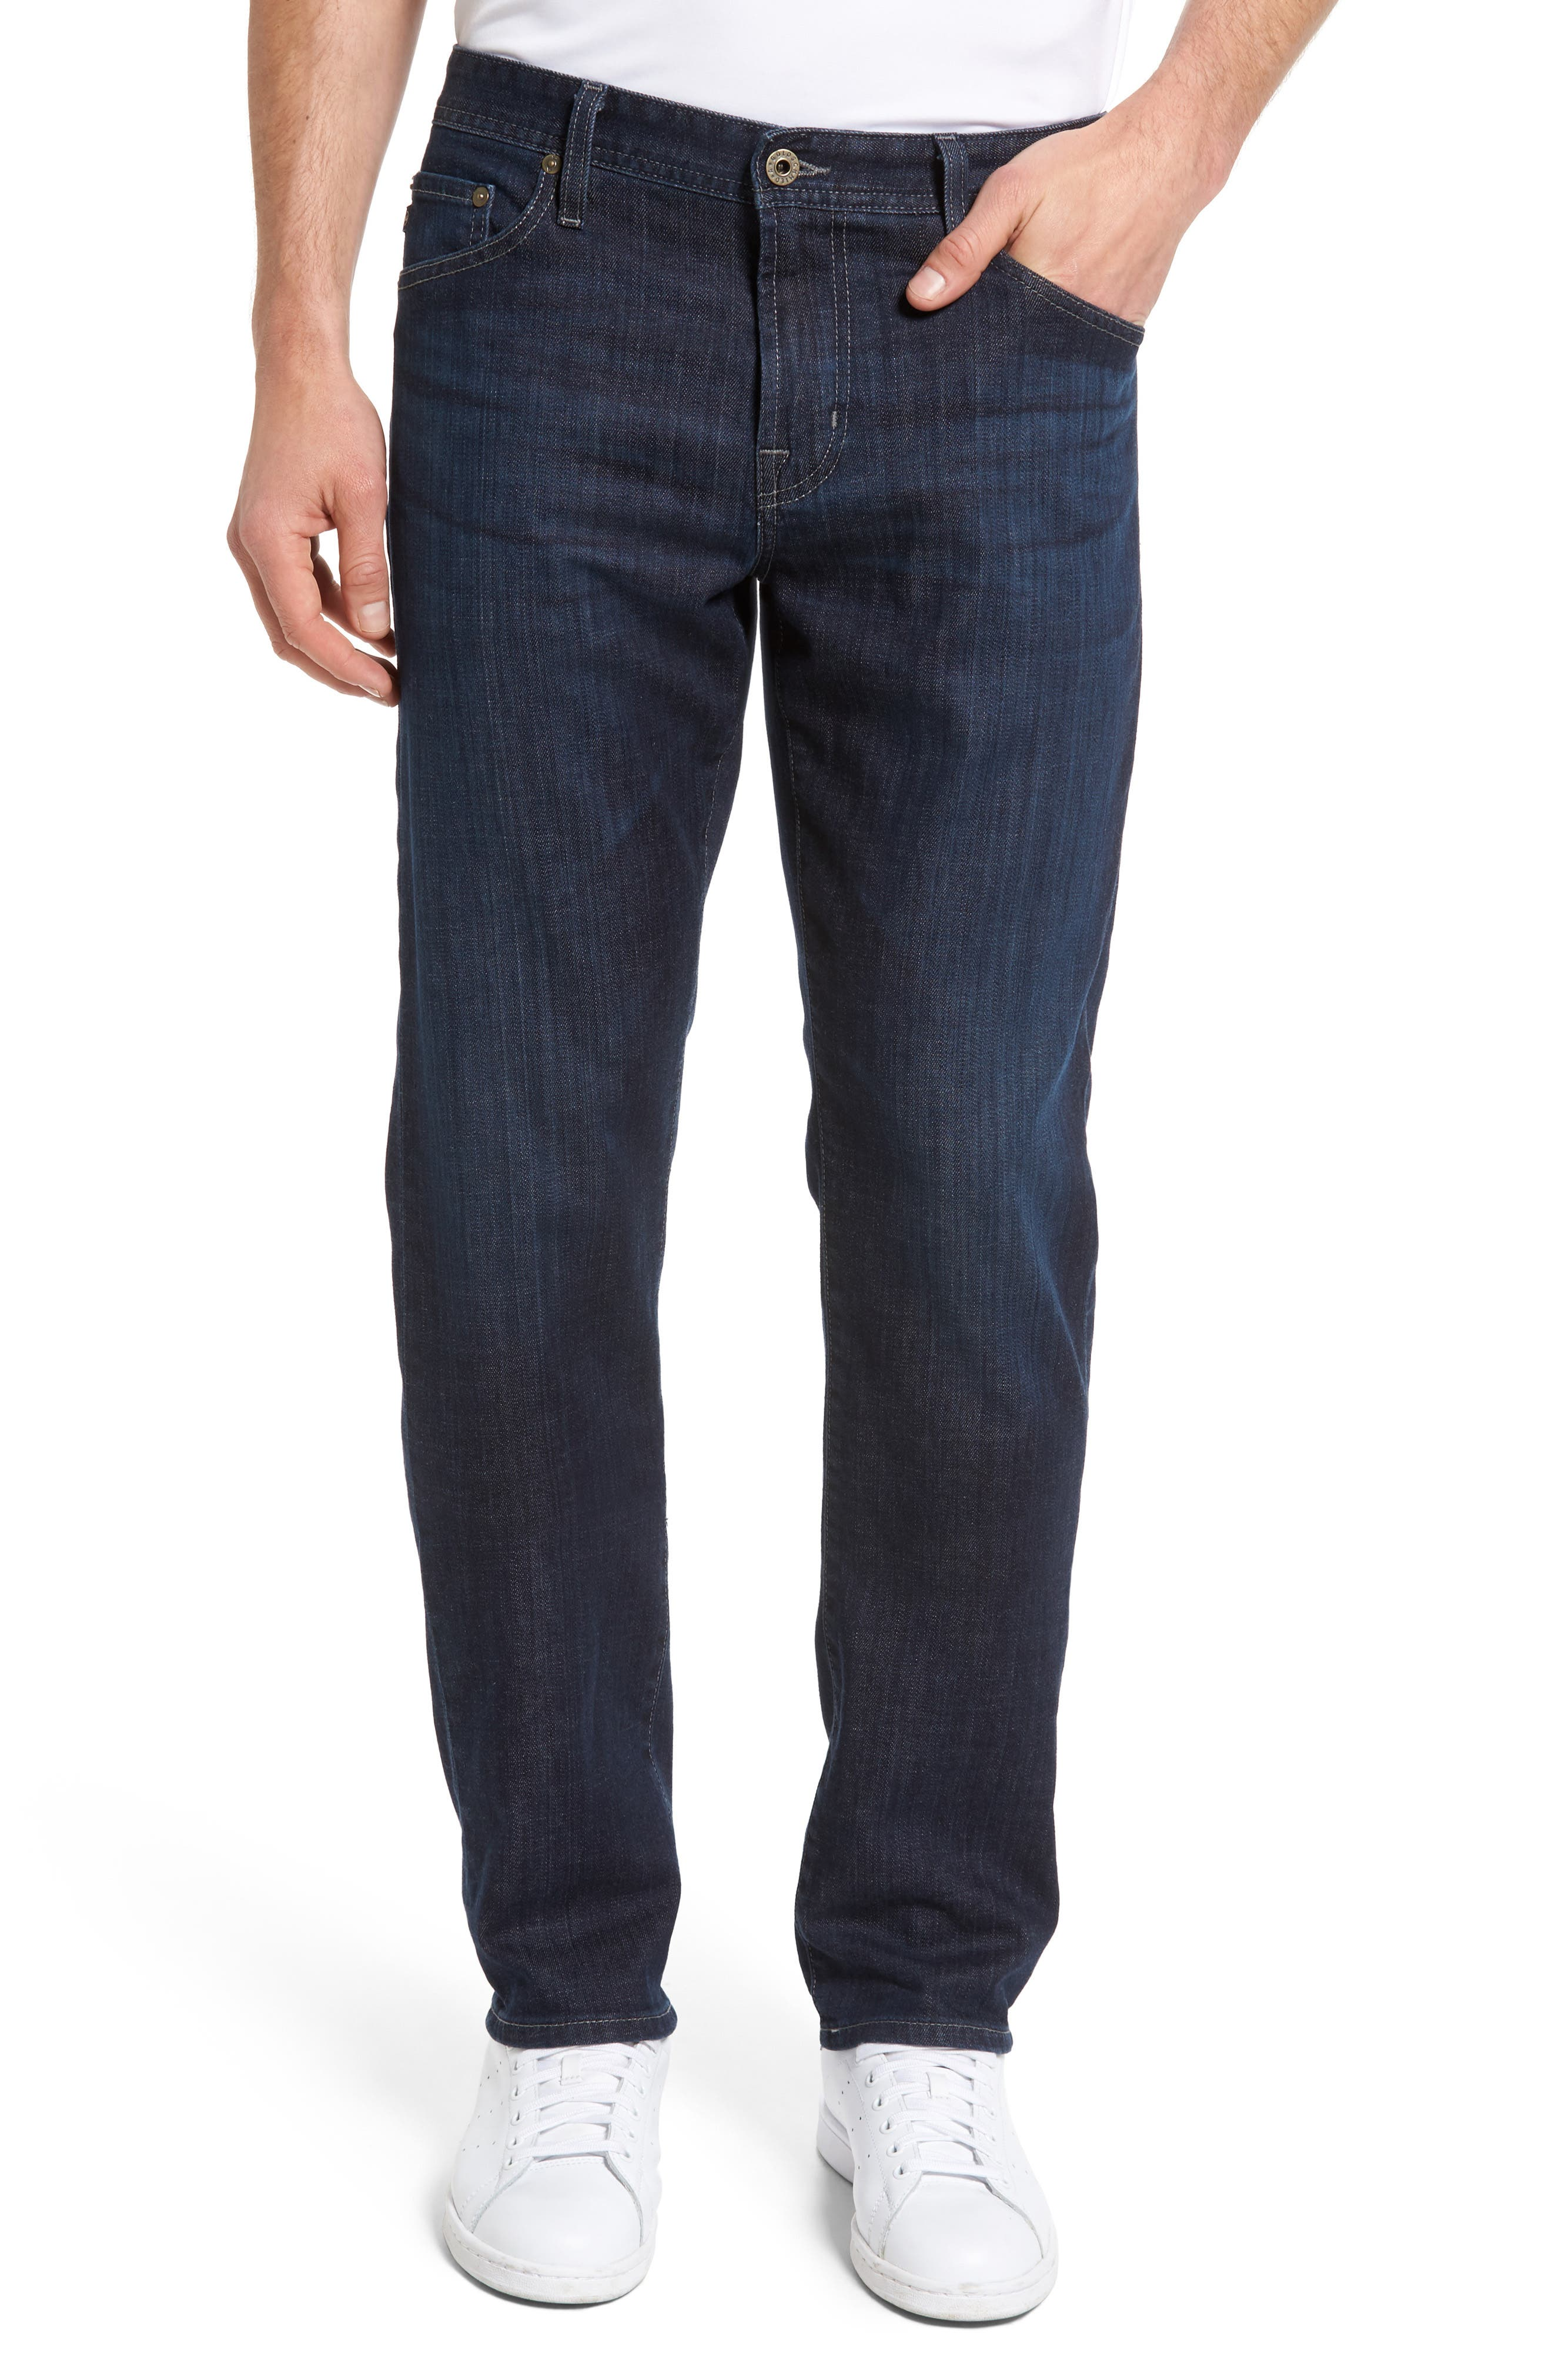 Graduate Slim Straight Leg Jeans,                         Main,                         color, 472